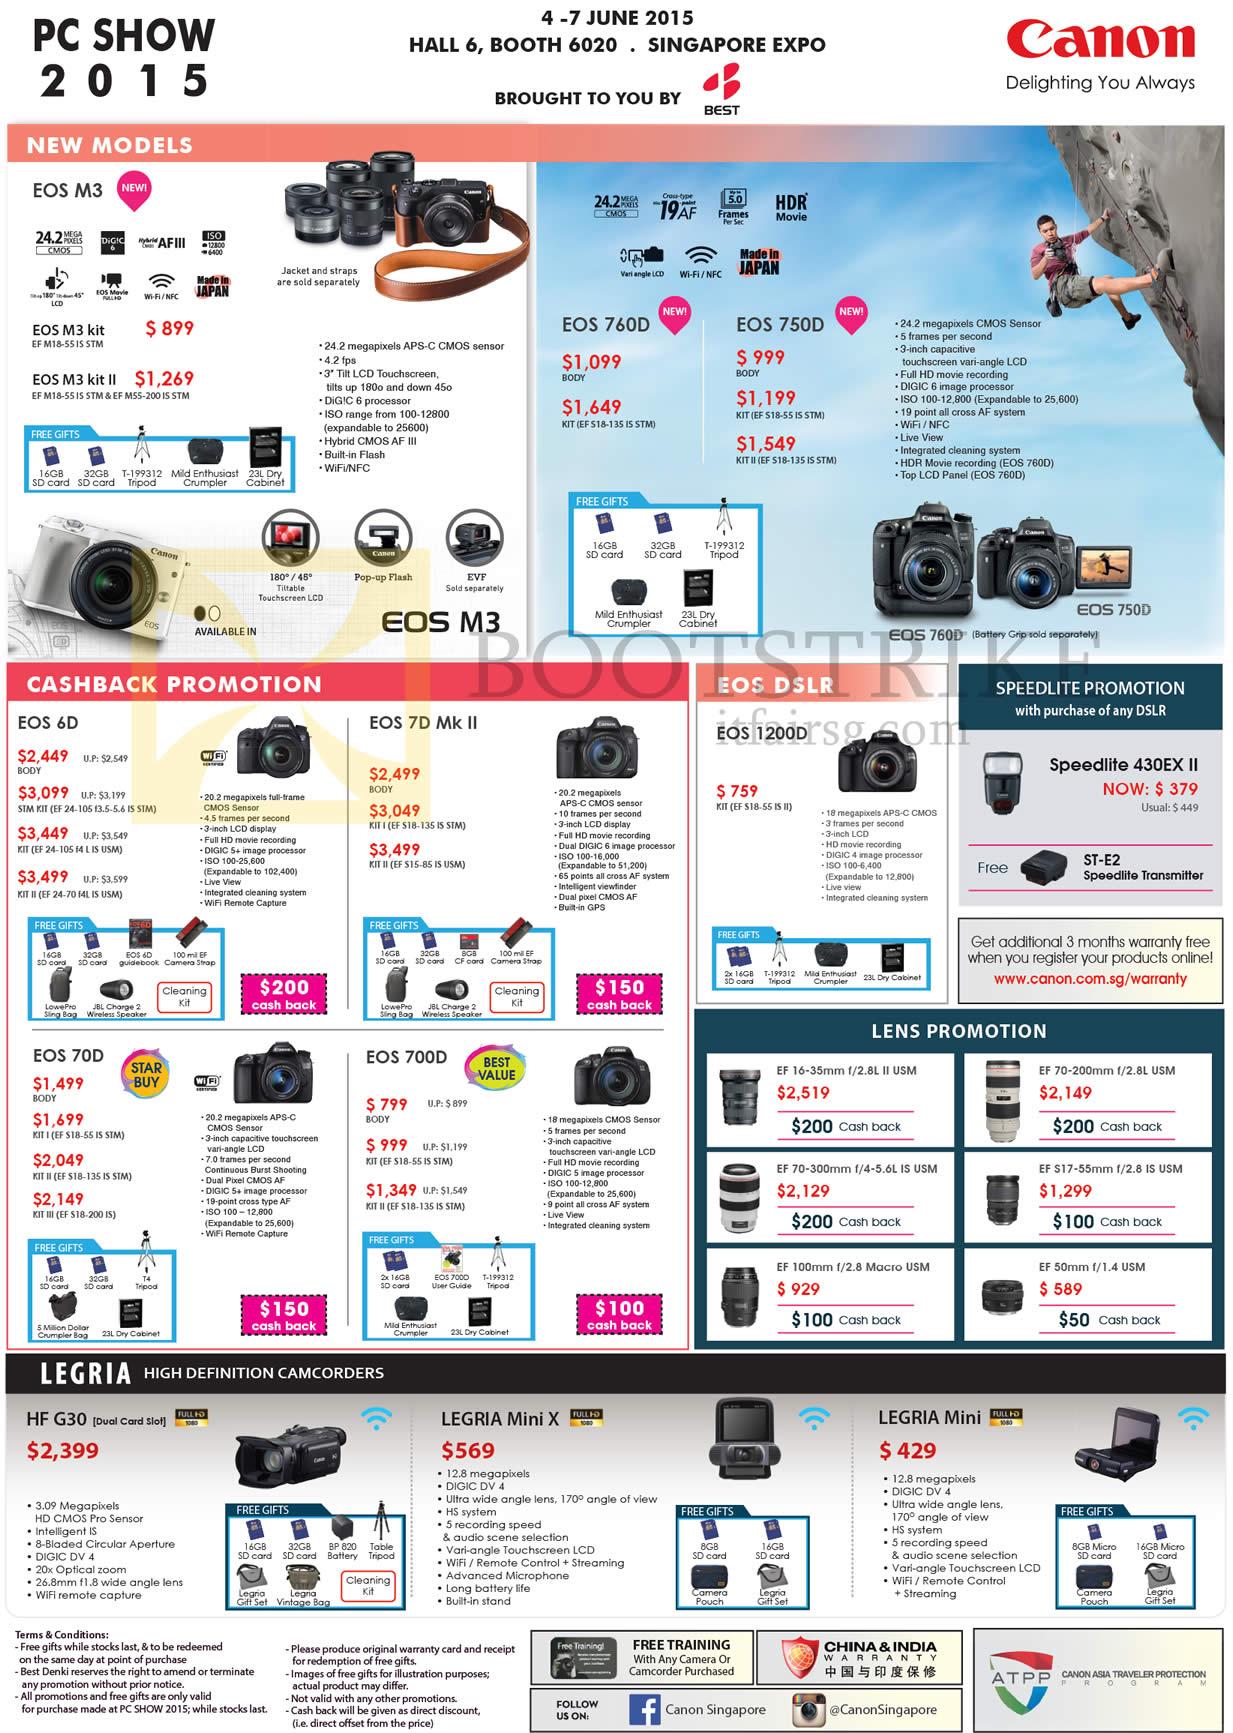 Camera Canon Dslr Camera Models List canon digital imaging promotion camera deal in town cameras dslr eos m3 760d 750d 6d 7d mk ii 1200d 70d 700d legria hf g30 mini x lenses